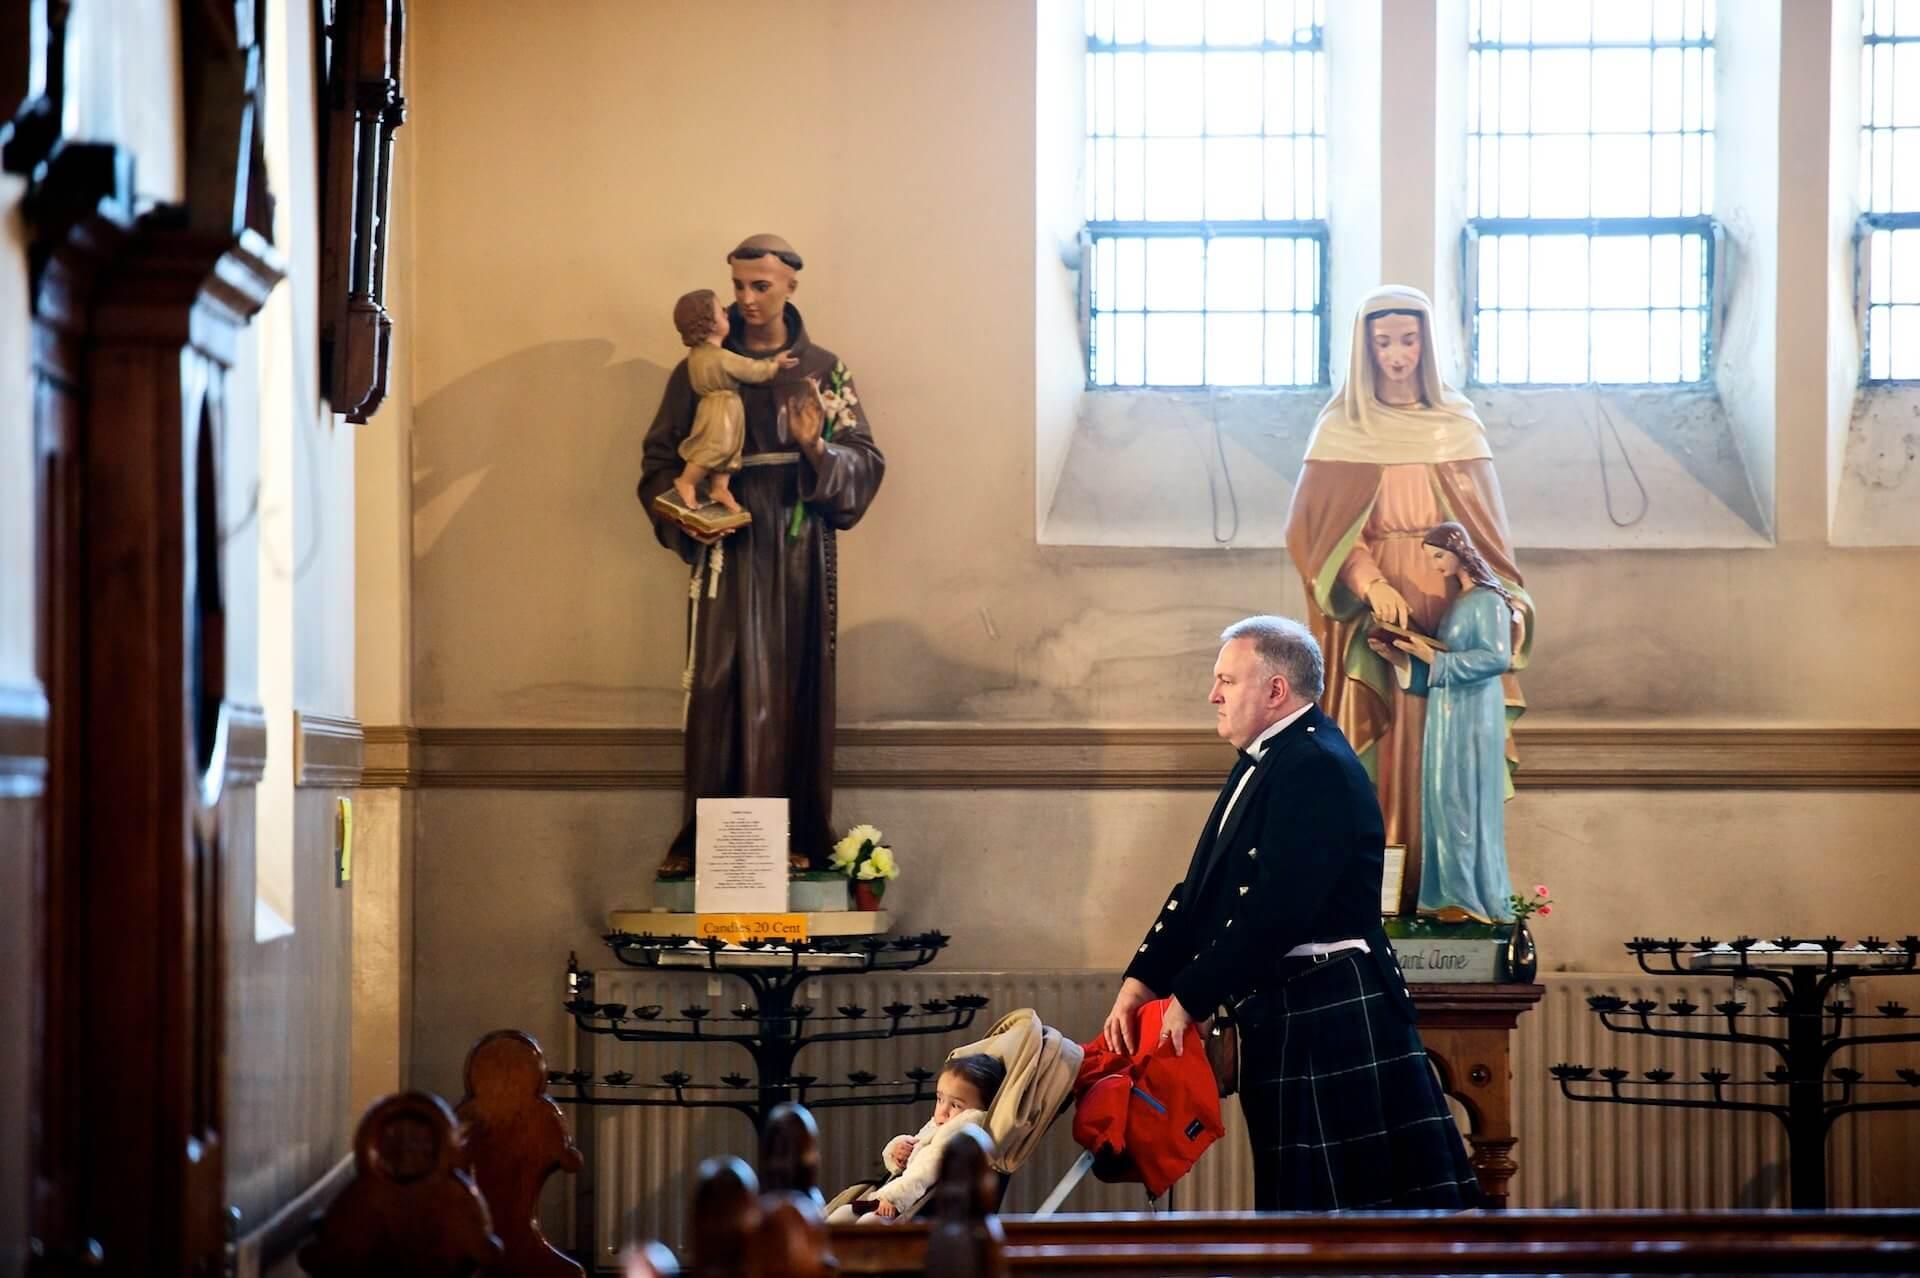 008 Wedding St Michaels Church Inchicore Child in Pram